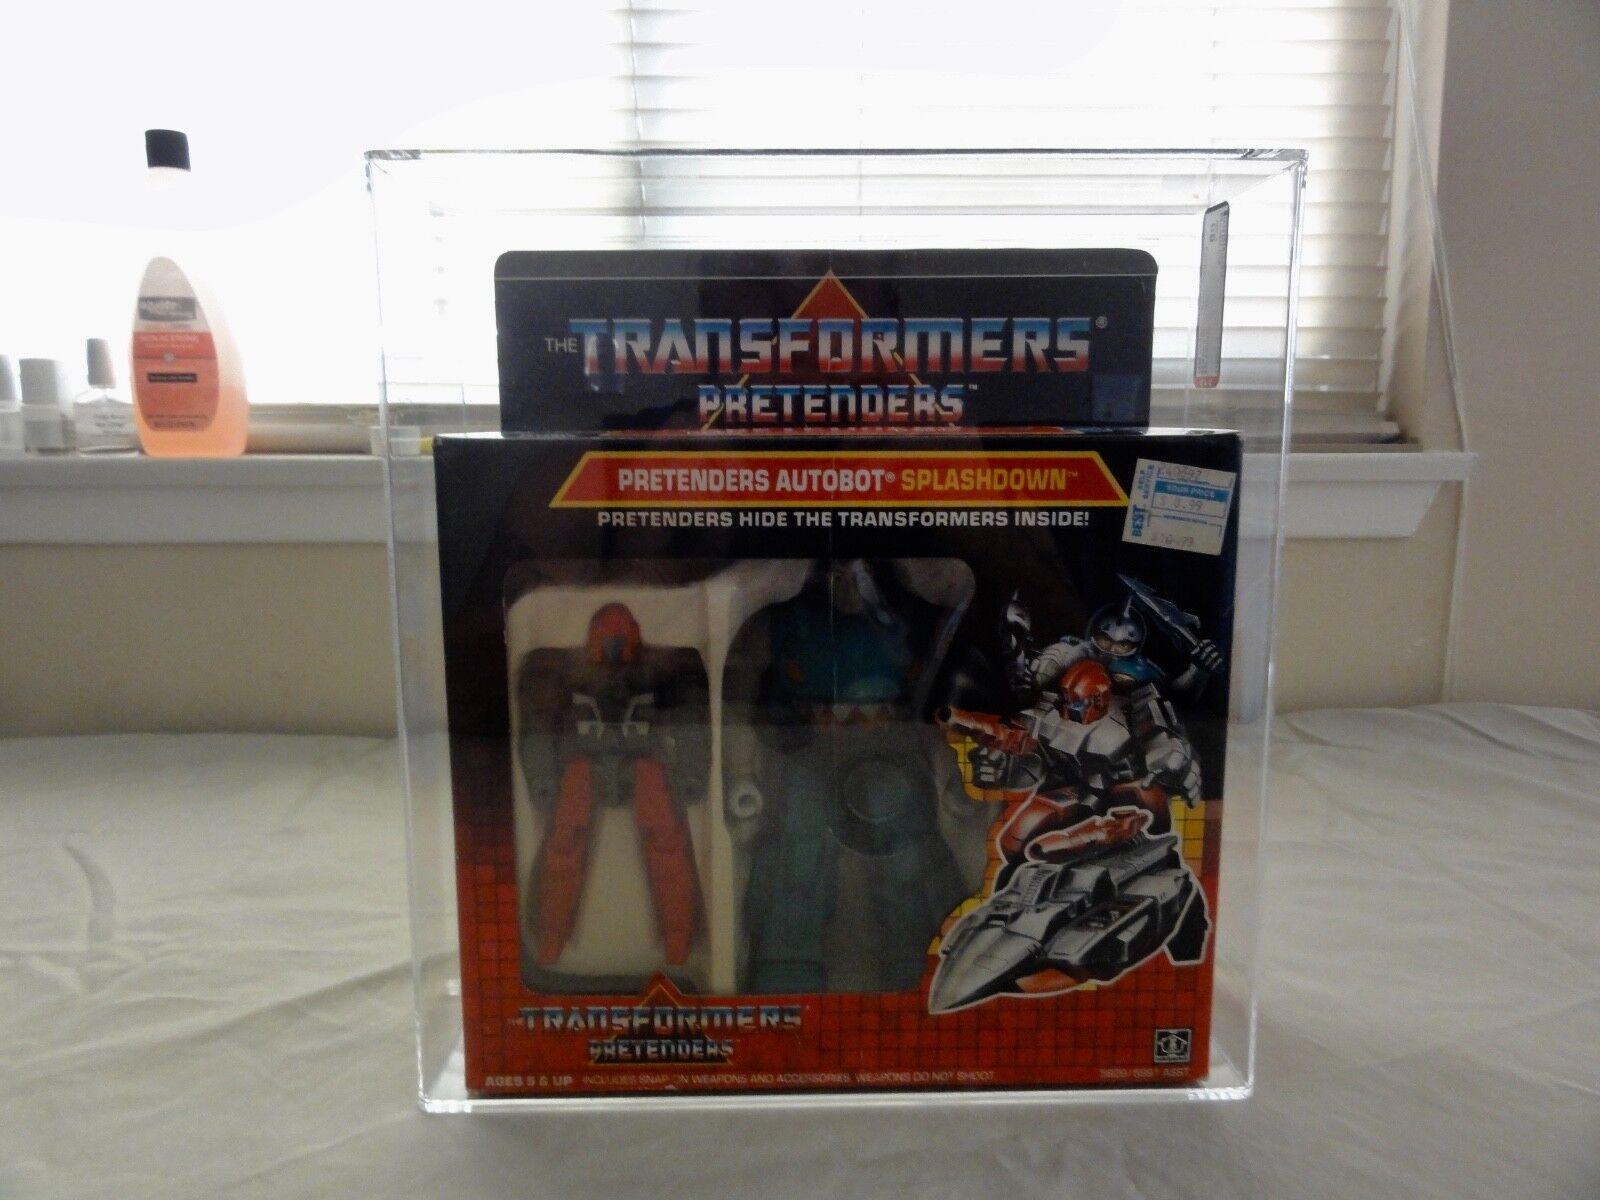 1988 Transformers AFA Autobot Pretenders  Splashdown MISB MIB scatola  prezzi equi